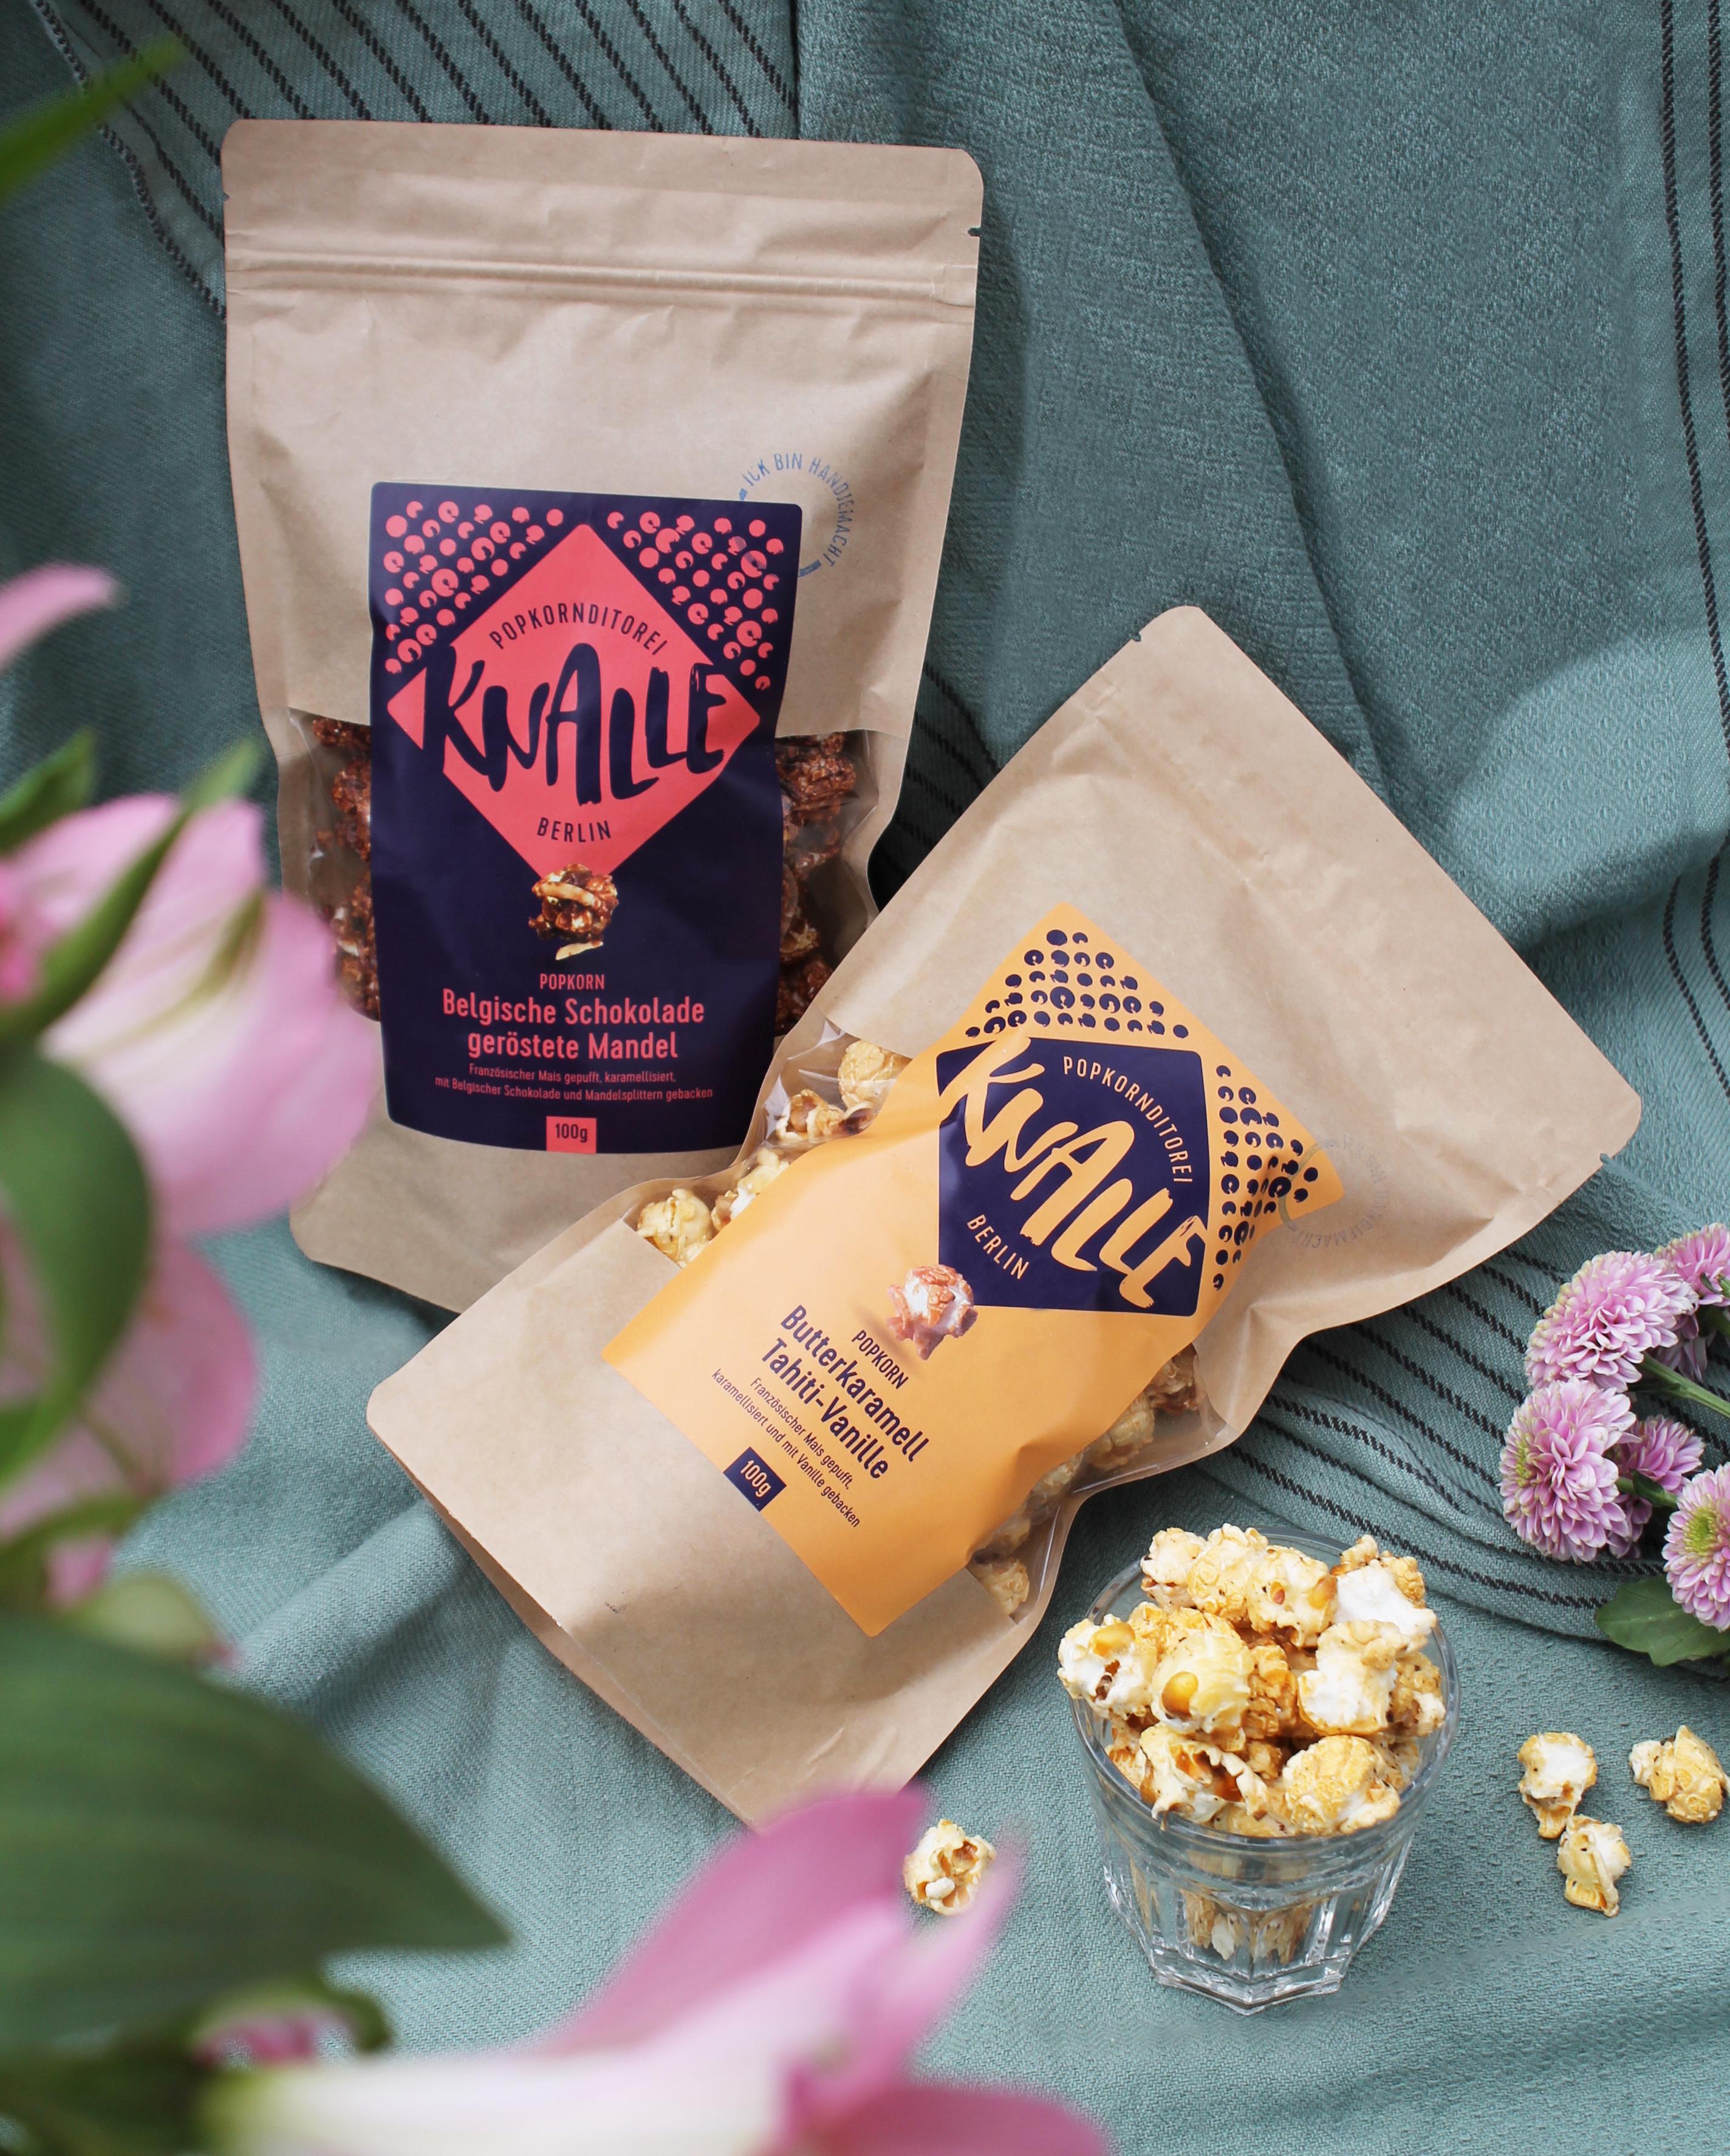 Picknick Knalle Popcorn